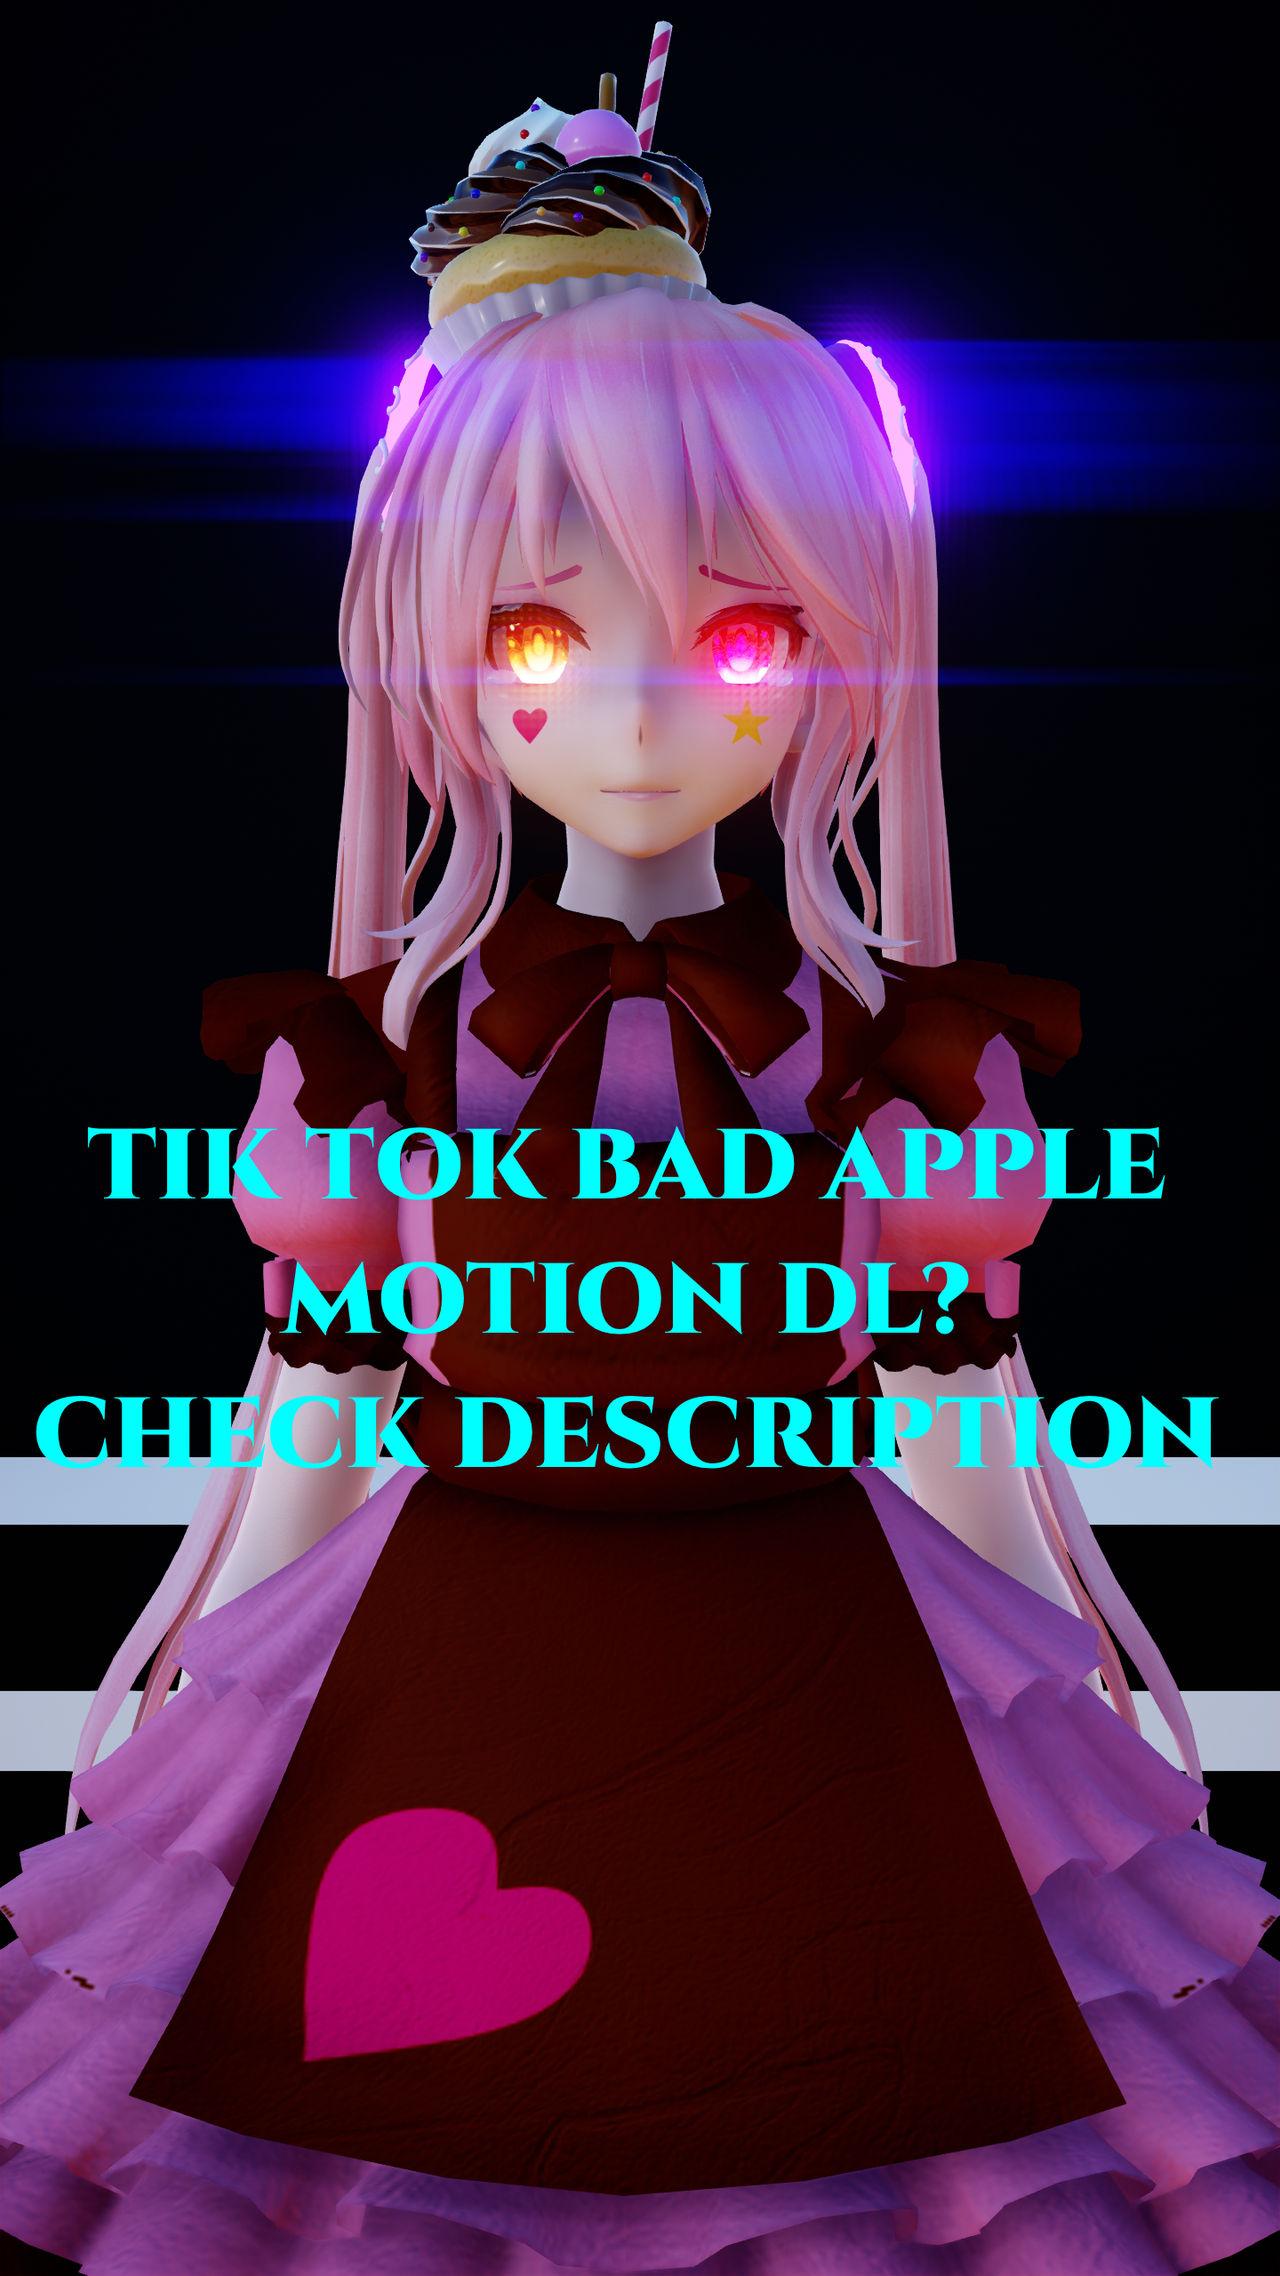 MMDxOCxTIKTOK] BADD APPLE [MOTION DL?] by XxNightBusterxX on